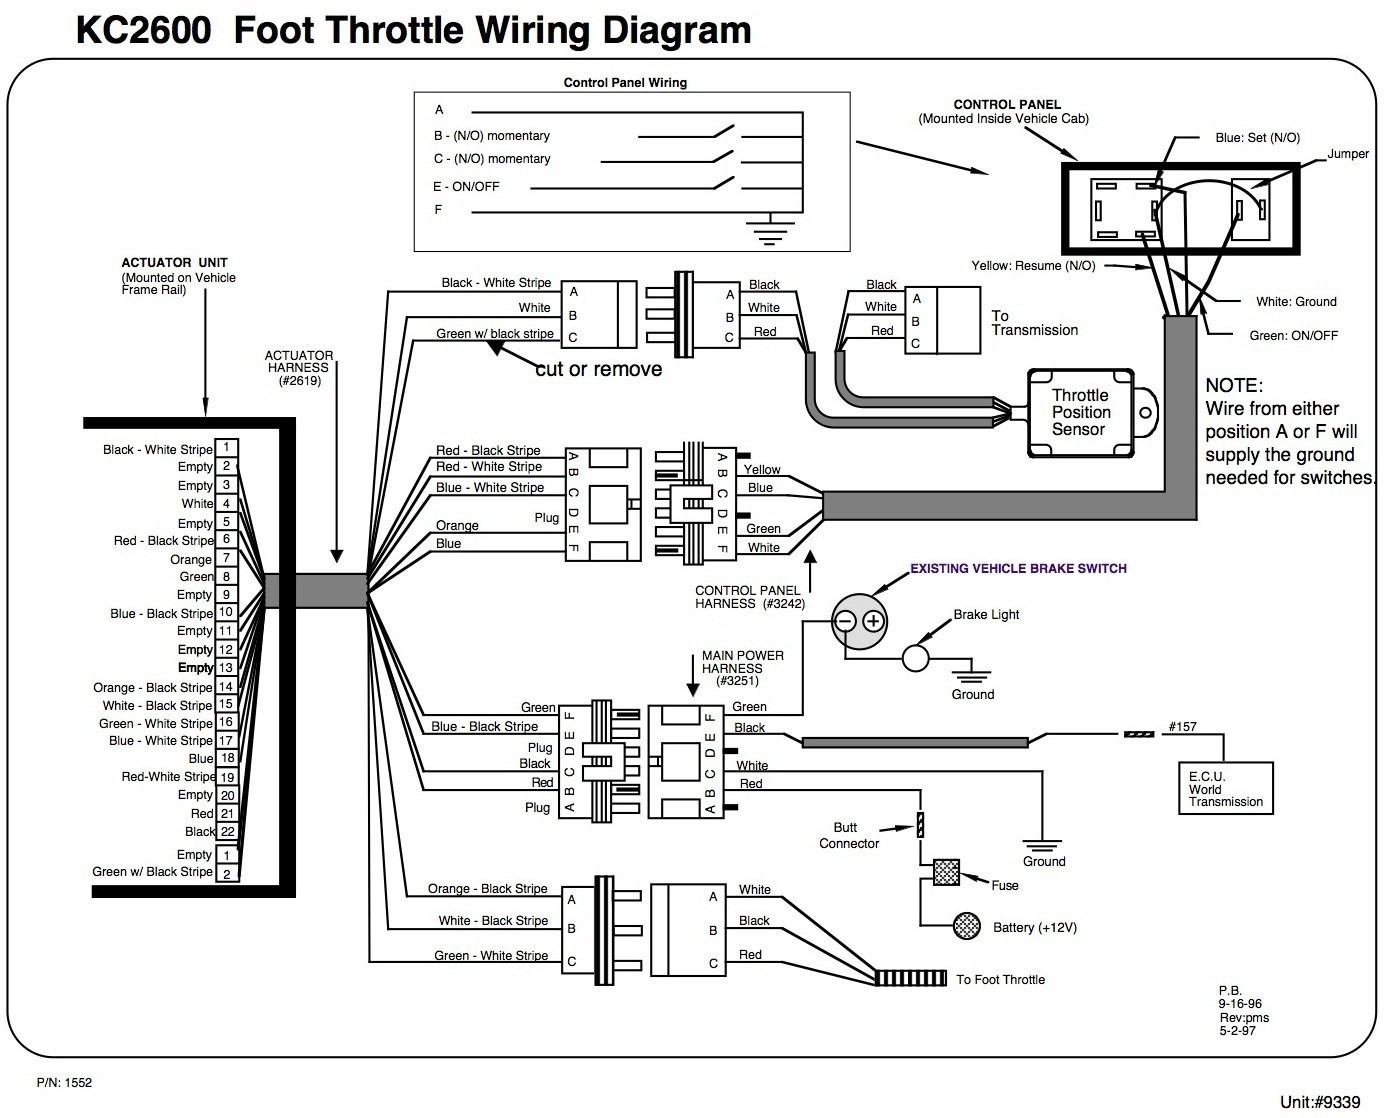 Awesome Md3060 Allison Transmission Wiring Diagram